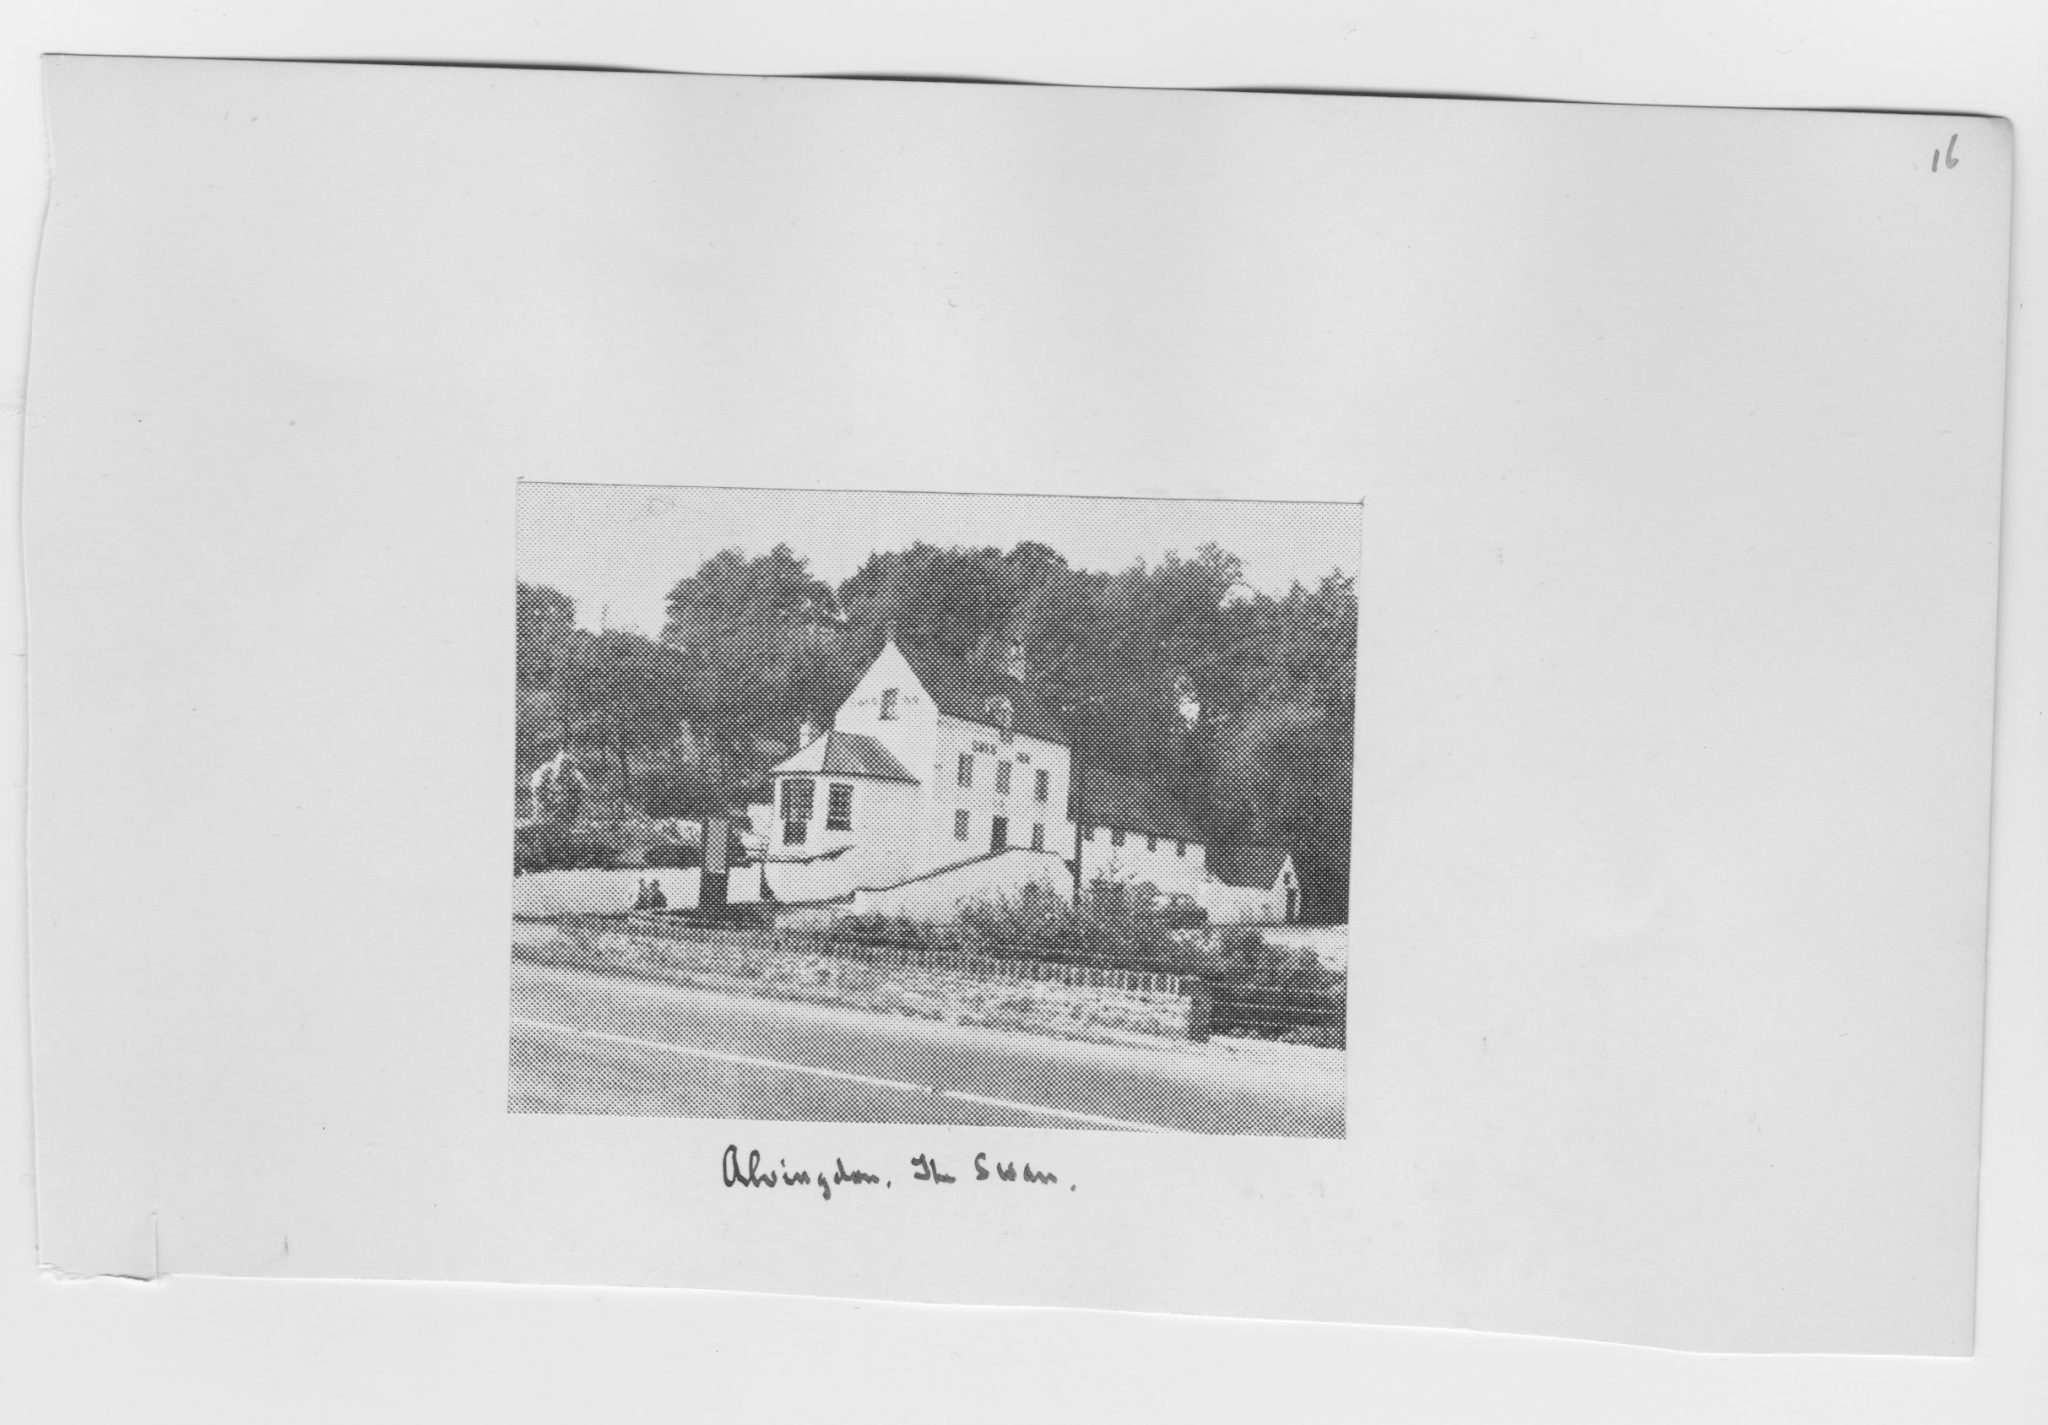 Photograph of The Swan pub Abingdon circa 1956